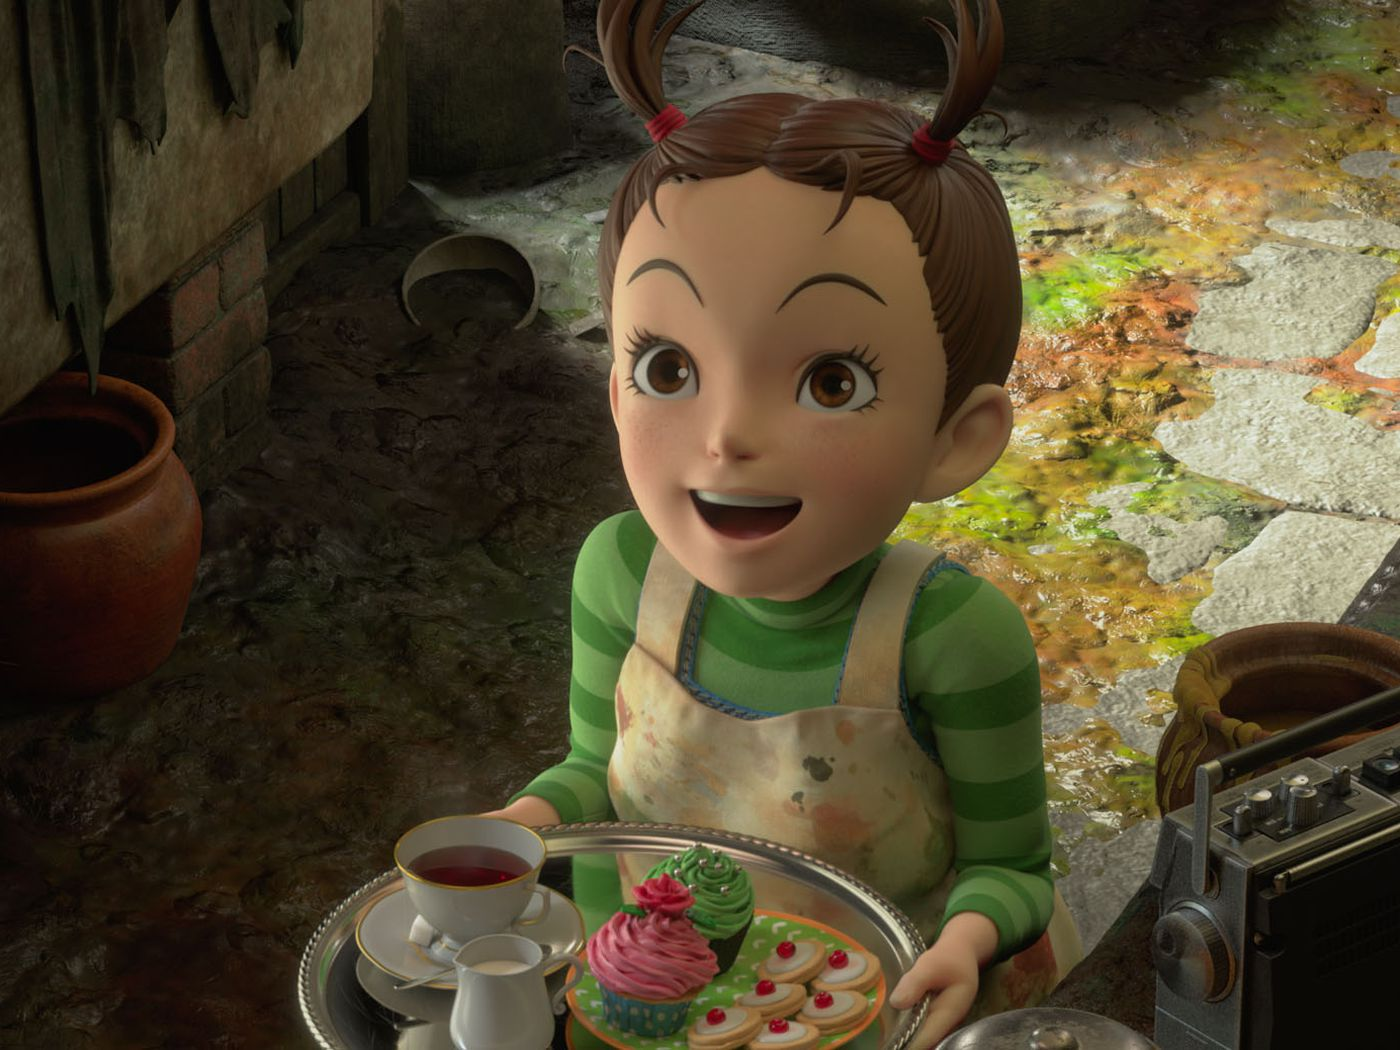 Goro Miyazaki explains Ghibli's first CG movie Earwig and Hayao's Pixar  rivalry - Polygon